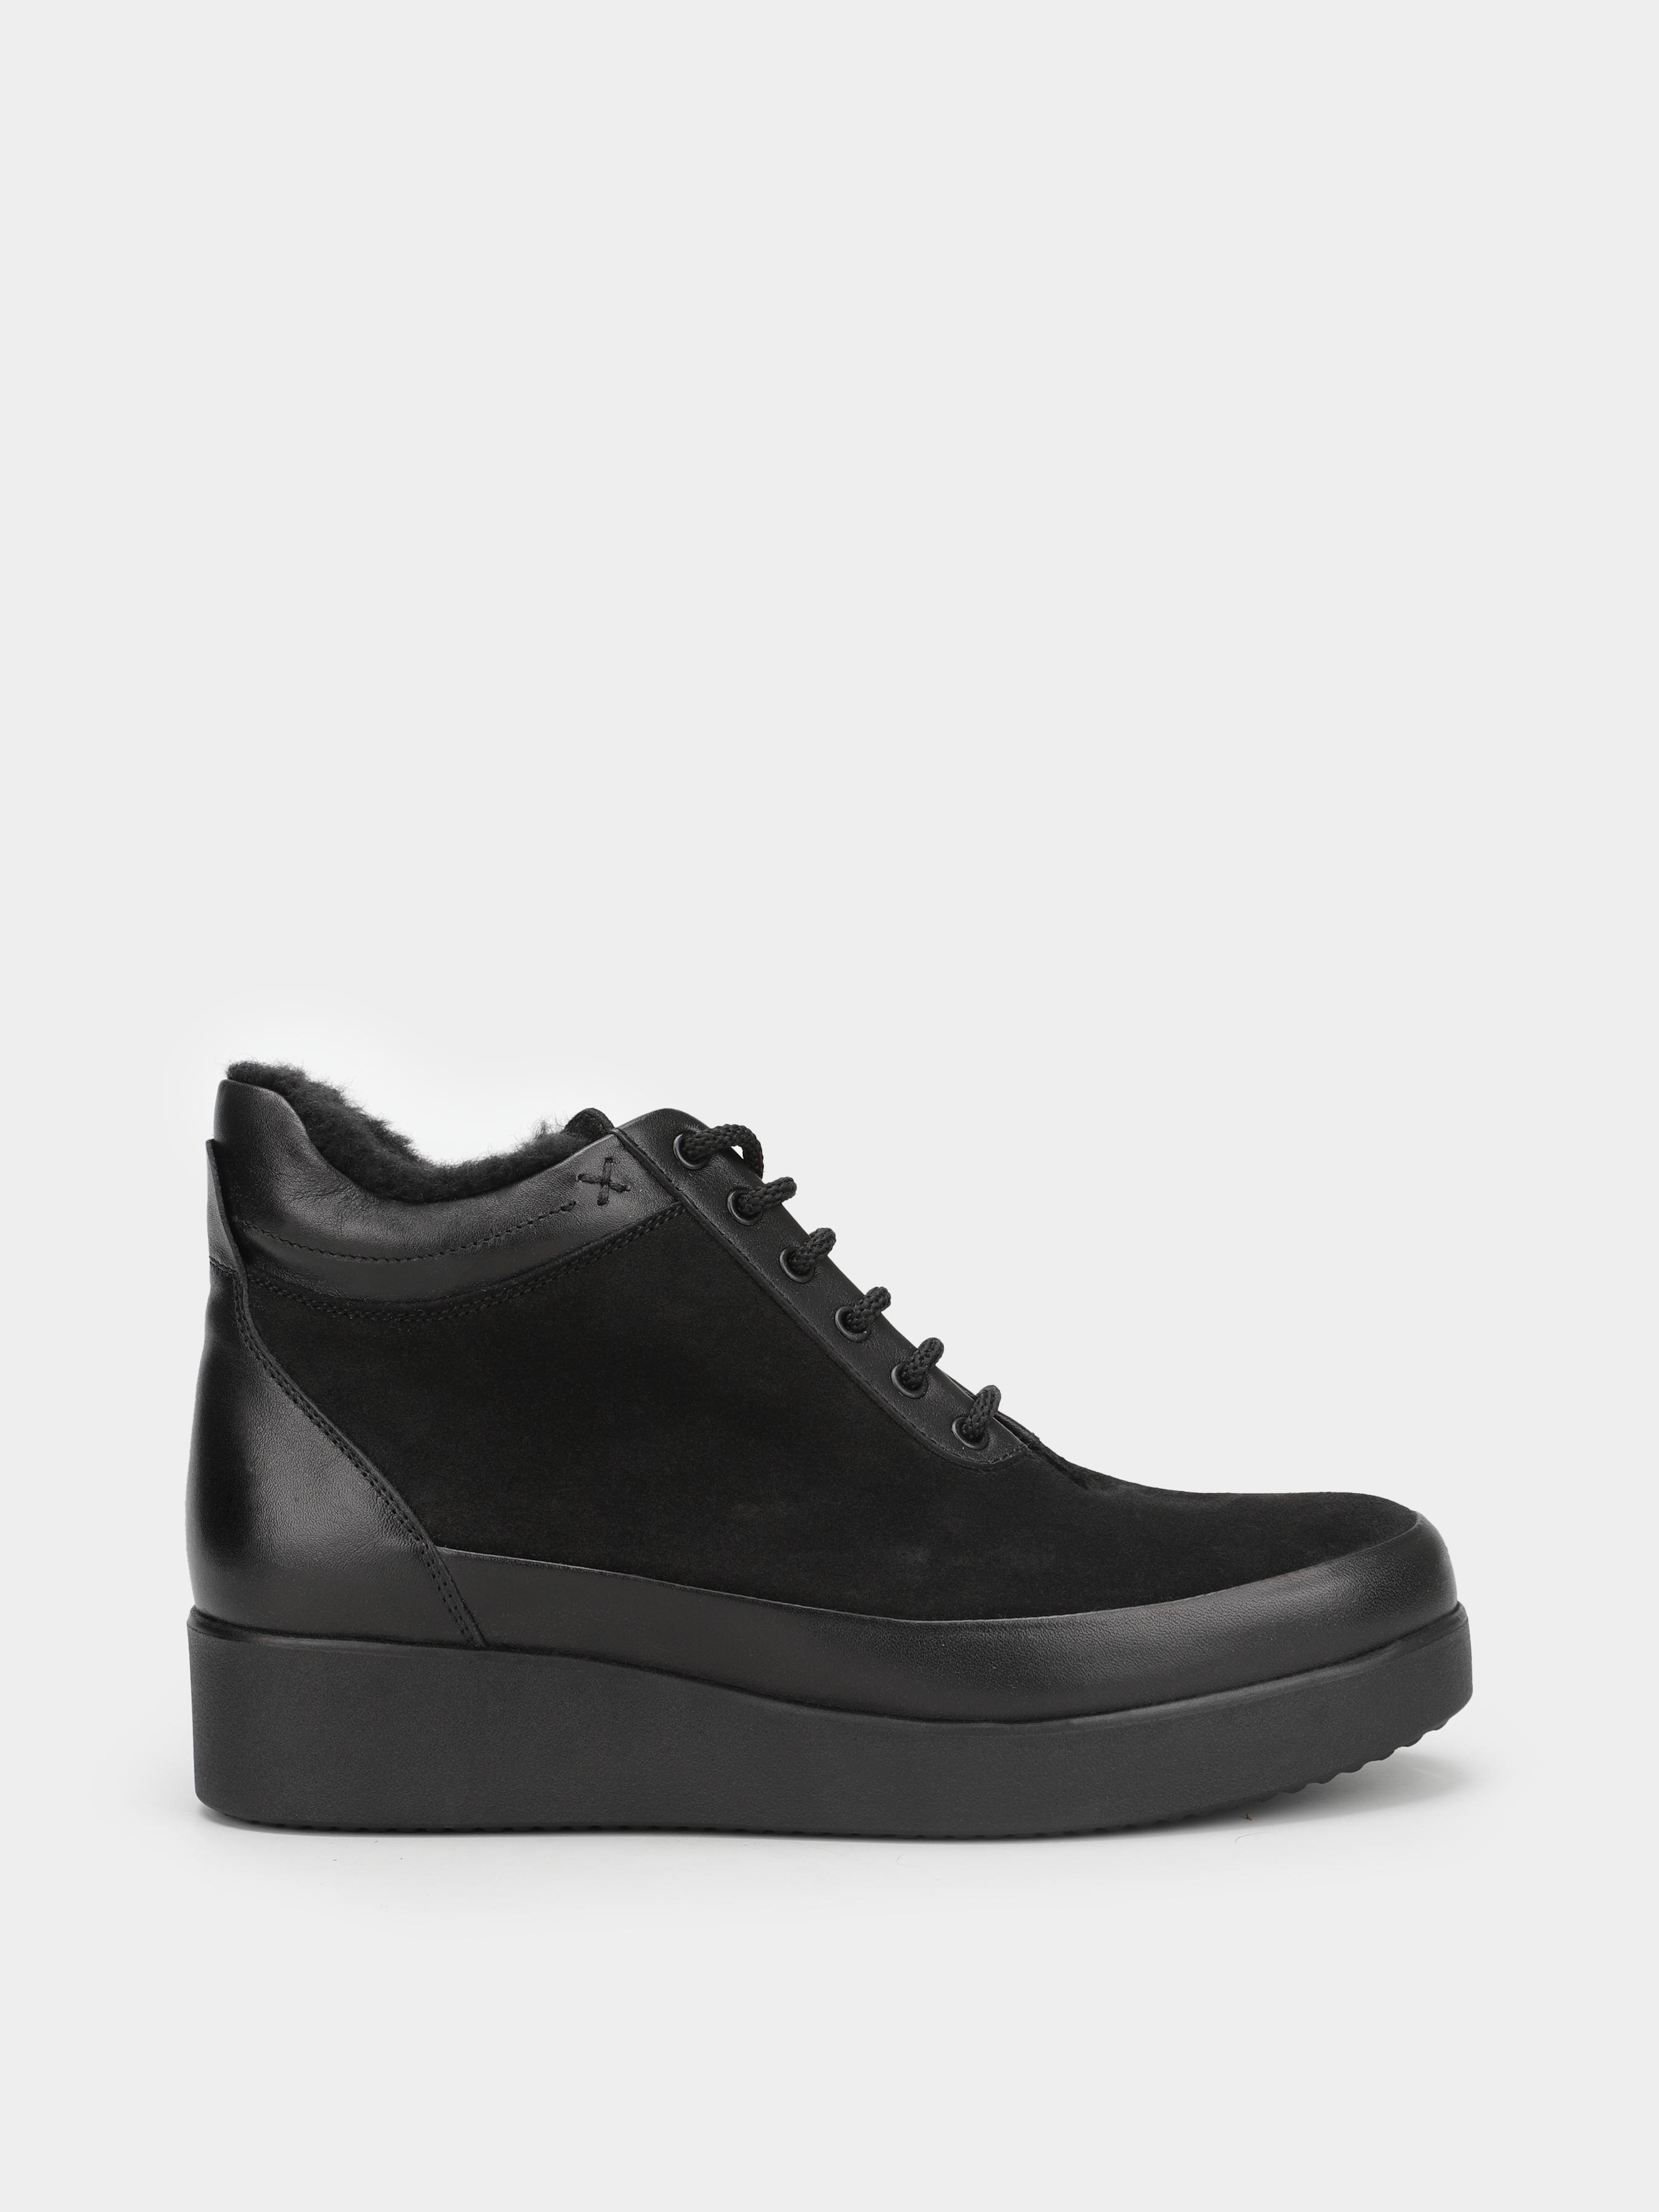 Ботинки для женщин Стептер 9K81 цена, 2017